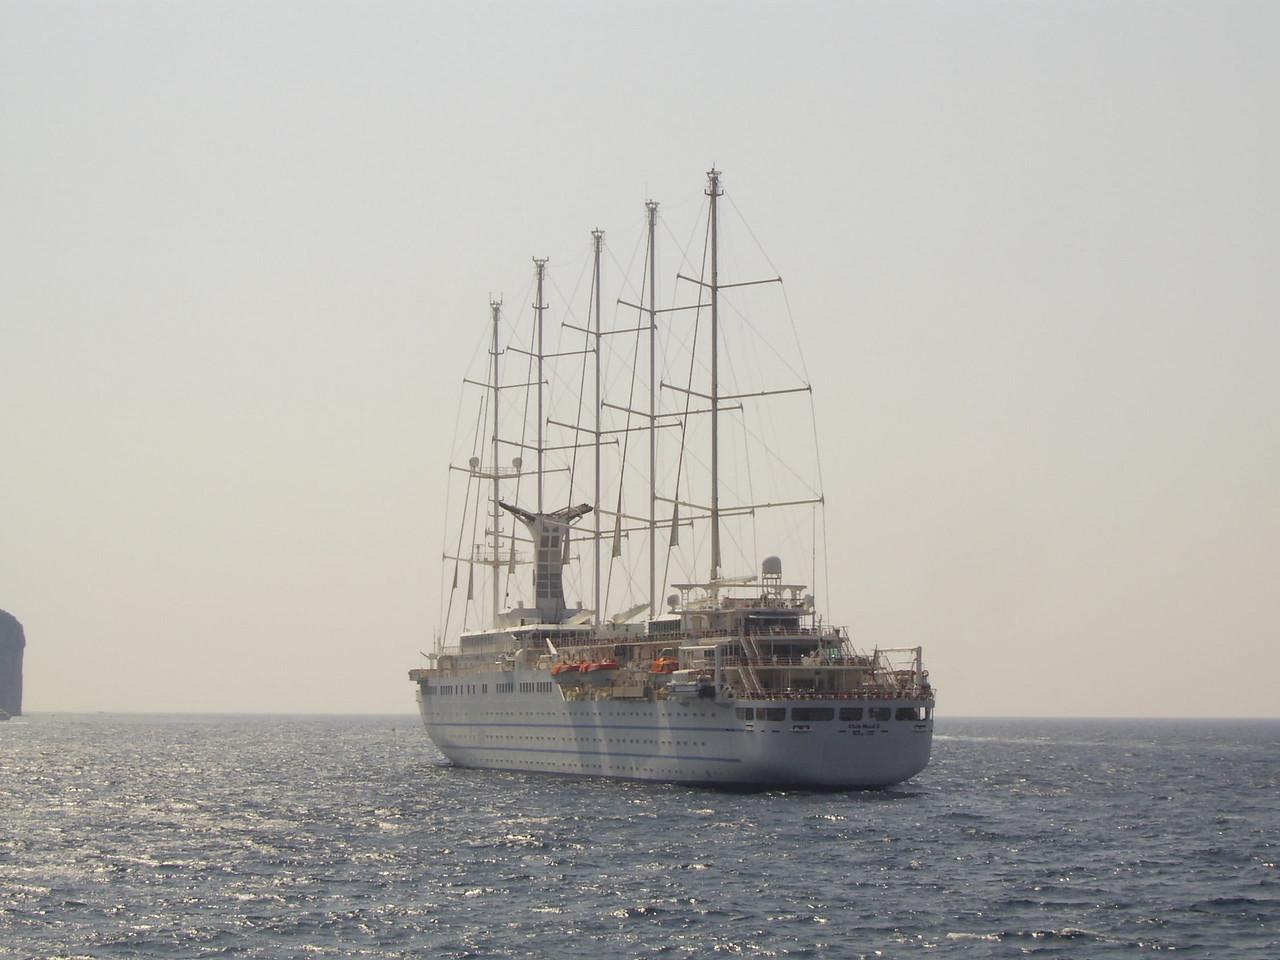 CLUB MED 2 offshore Capri.